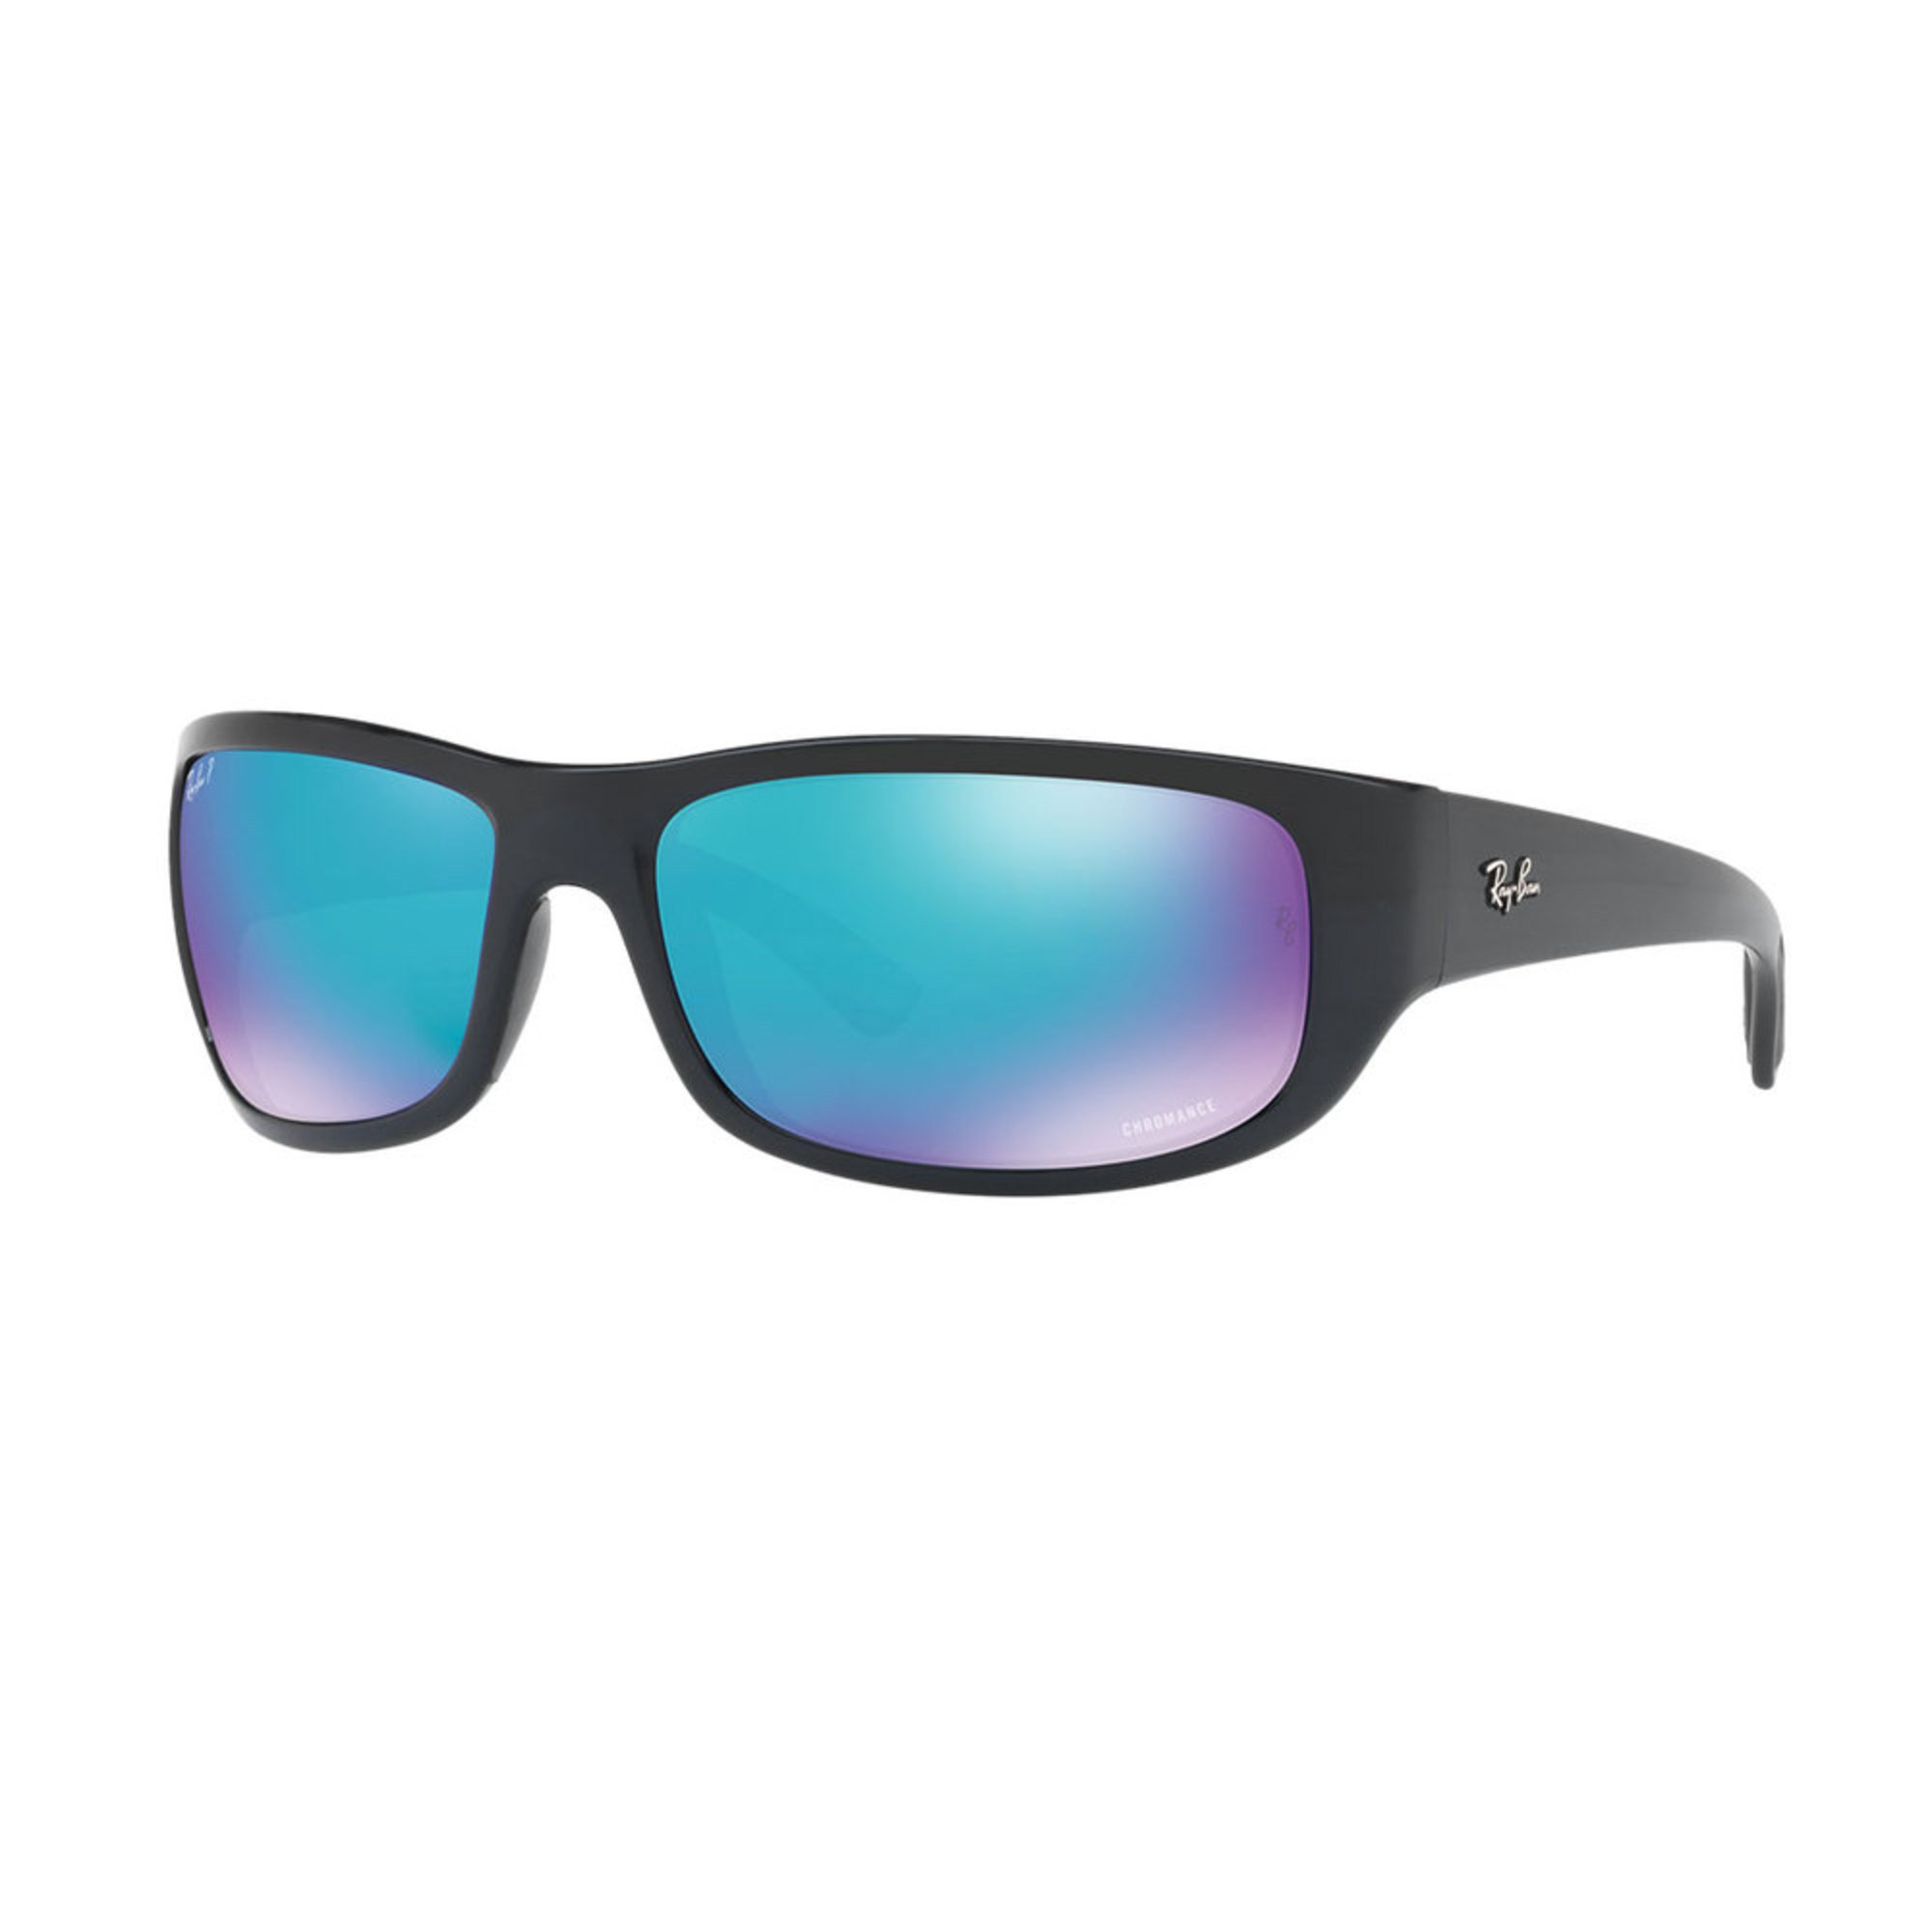 a557d644fc Ray-Ban. Ray-Ban Men s Rectangle Black Polarized Sunglasses 64mm